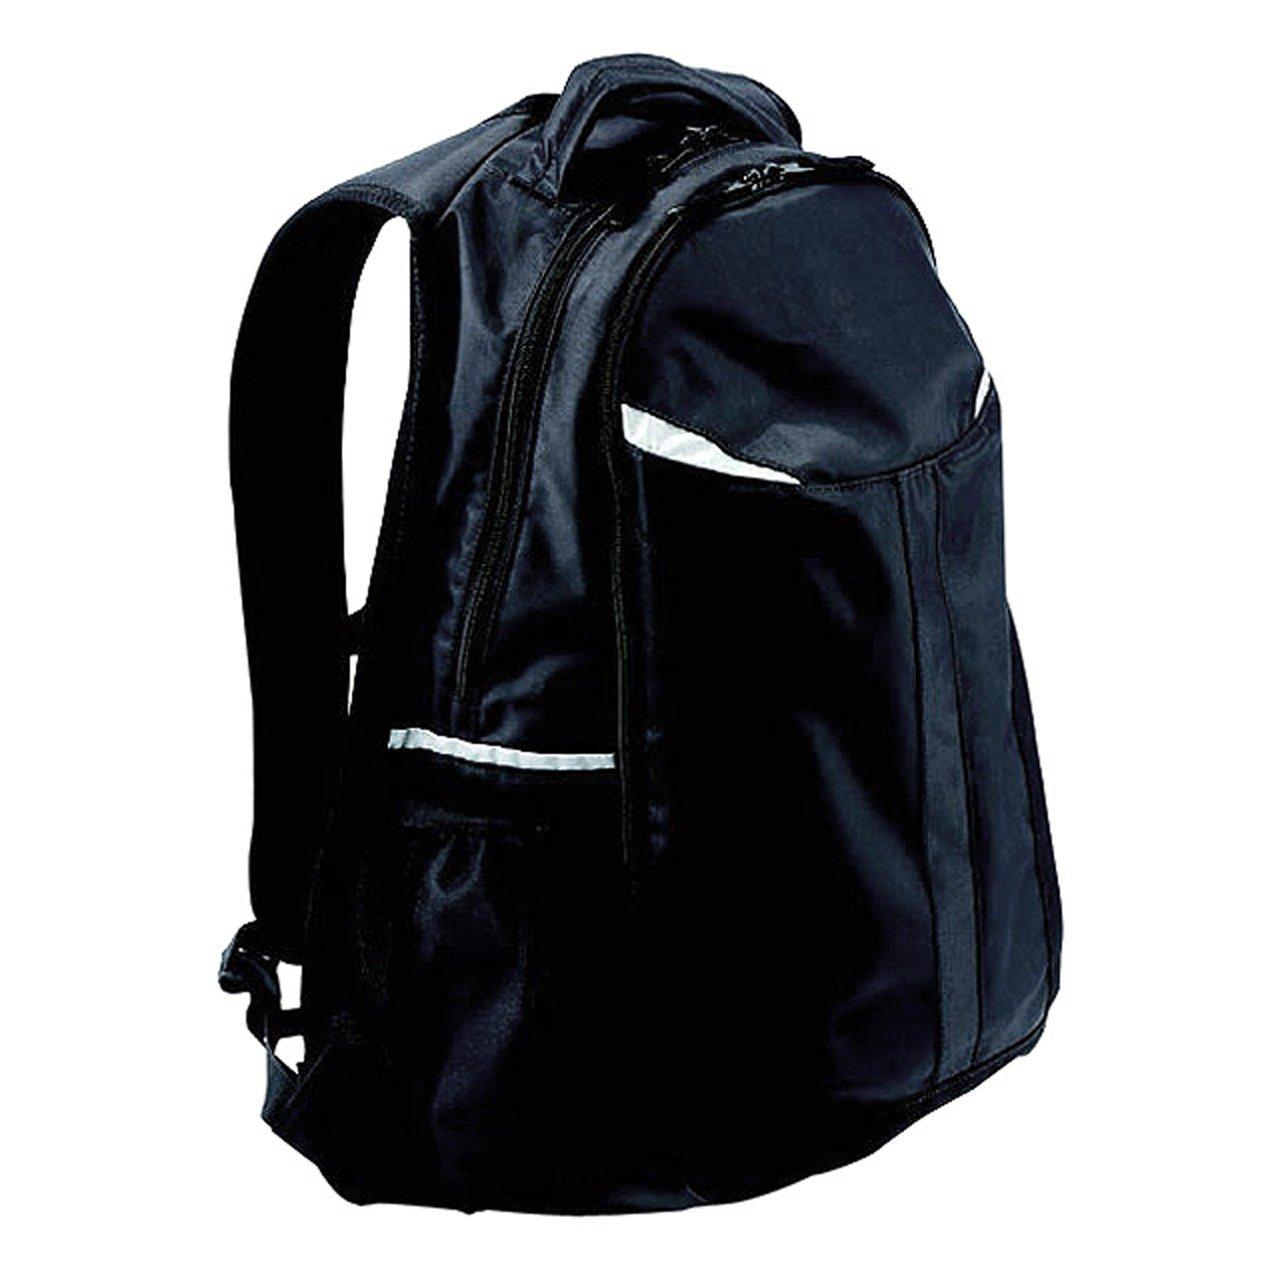 FOOTMARK(フットマーク)通学バッグ 中(28リットル重さ800g)101360 B00XOS71F2  ブラック(09) 中